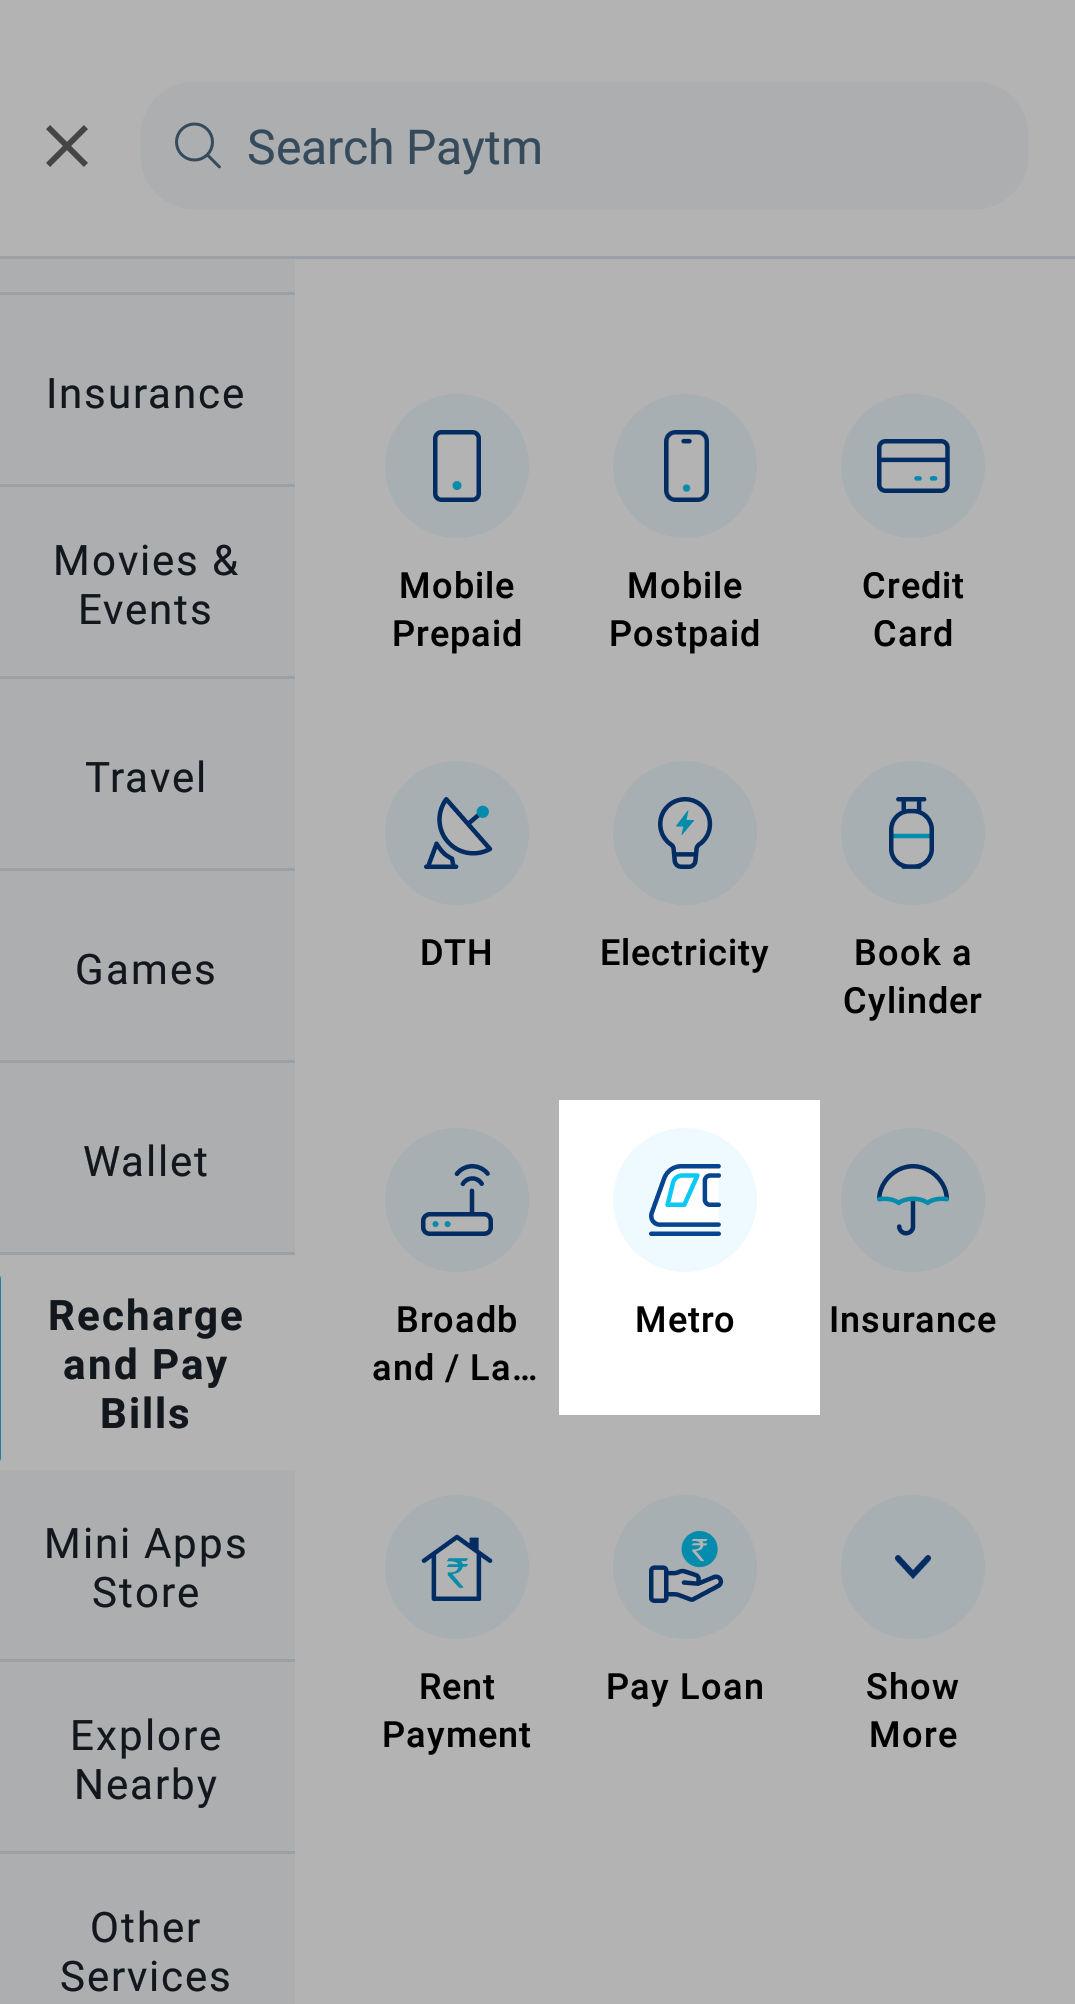 Metro Passengers of Delhi, Mumbai, Hyderabad, and Bangalore can easily recharge their metro card on Paytm